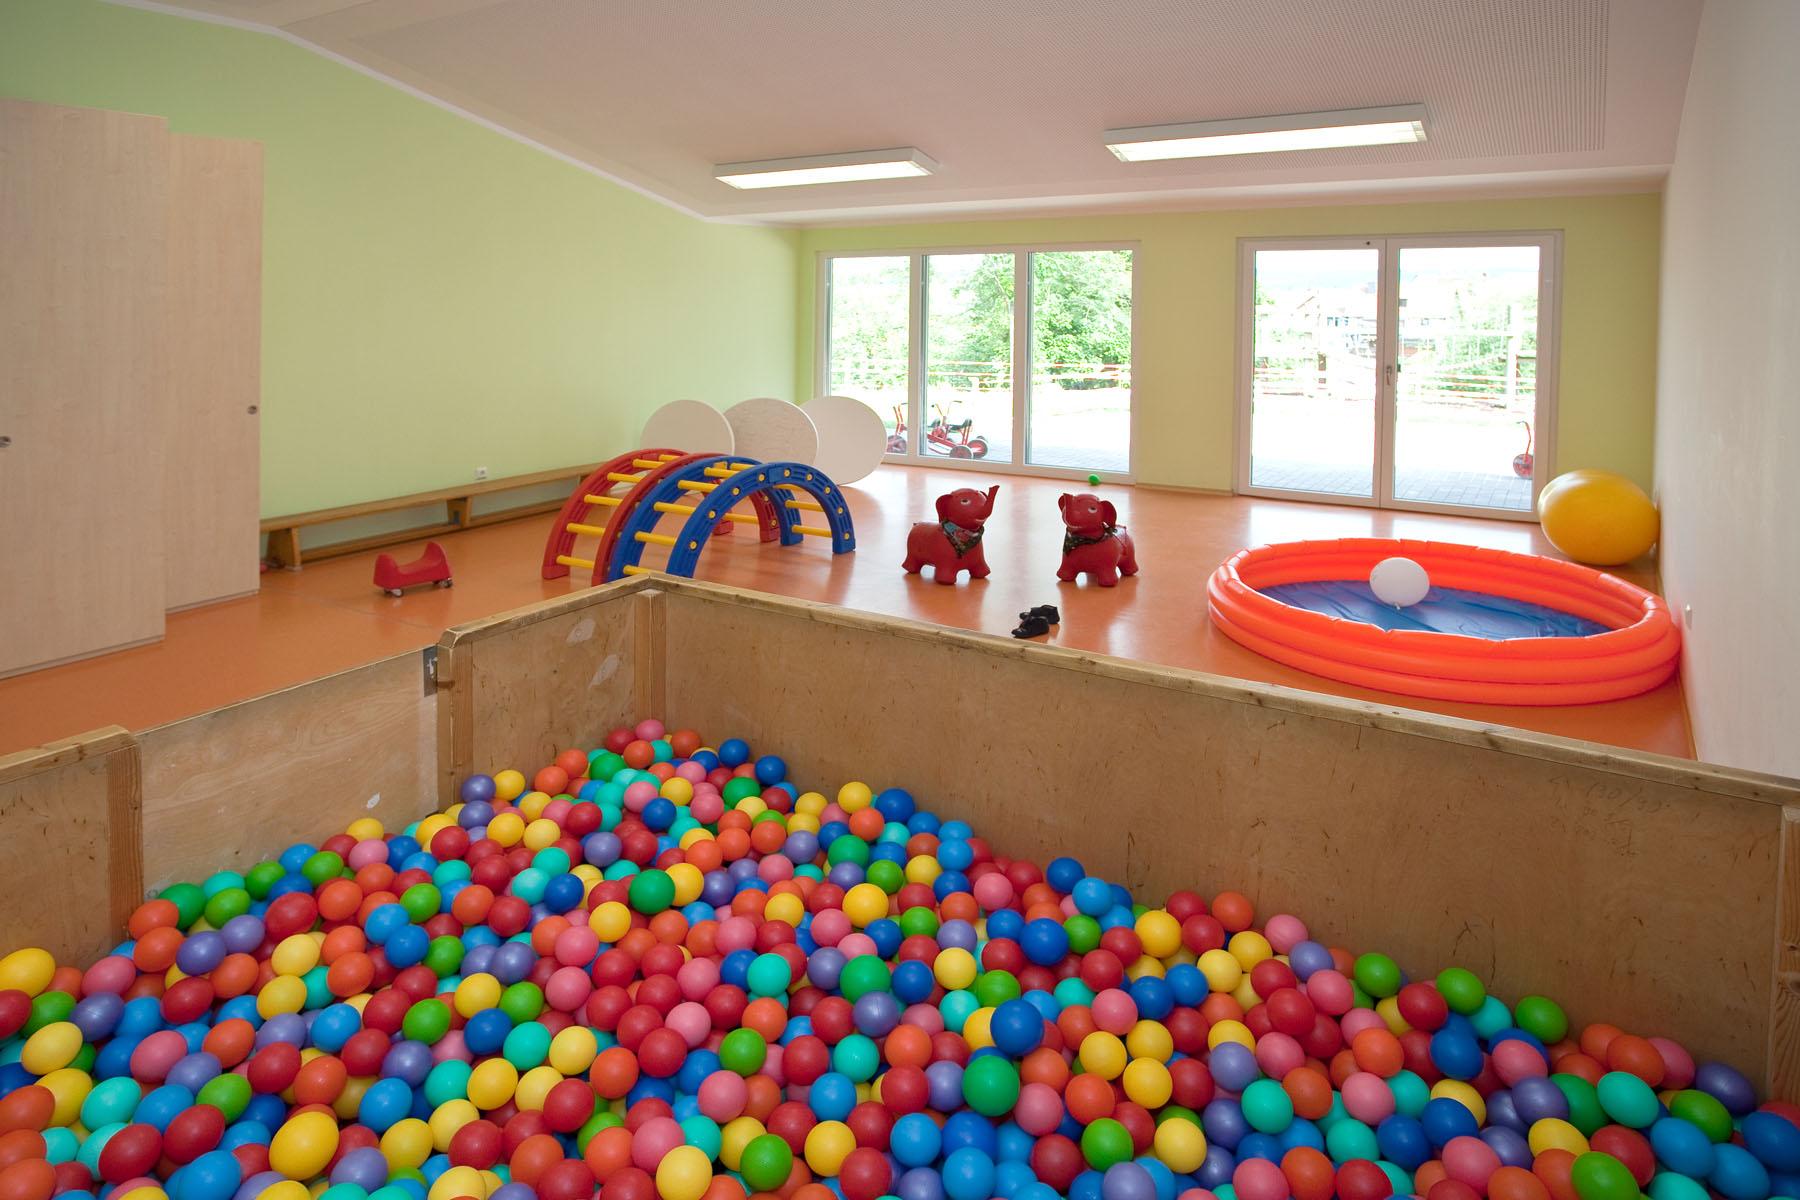 Bällebad im Kindergarten